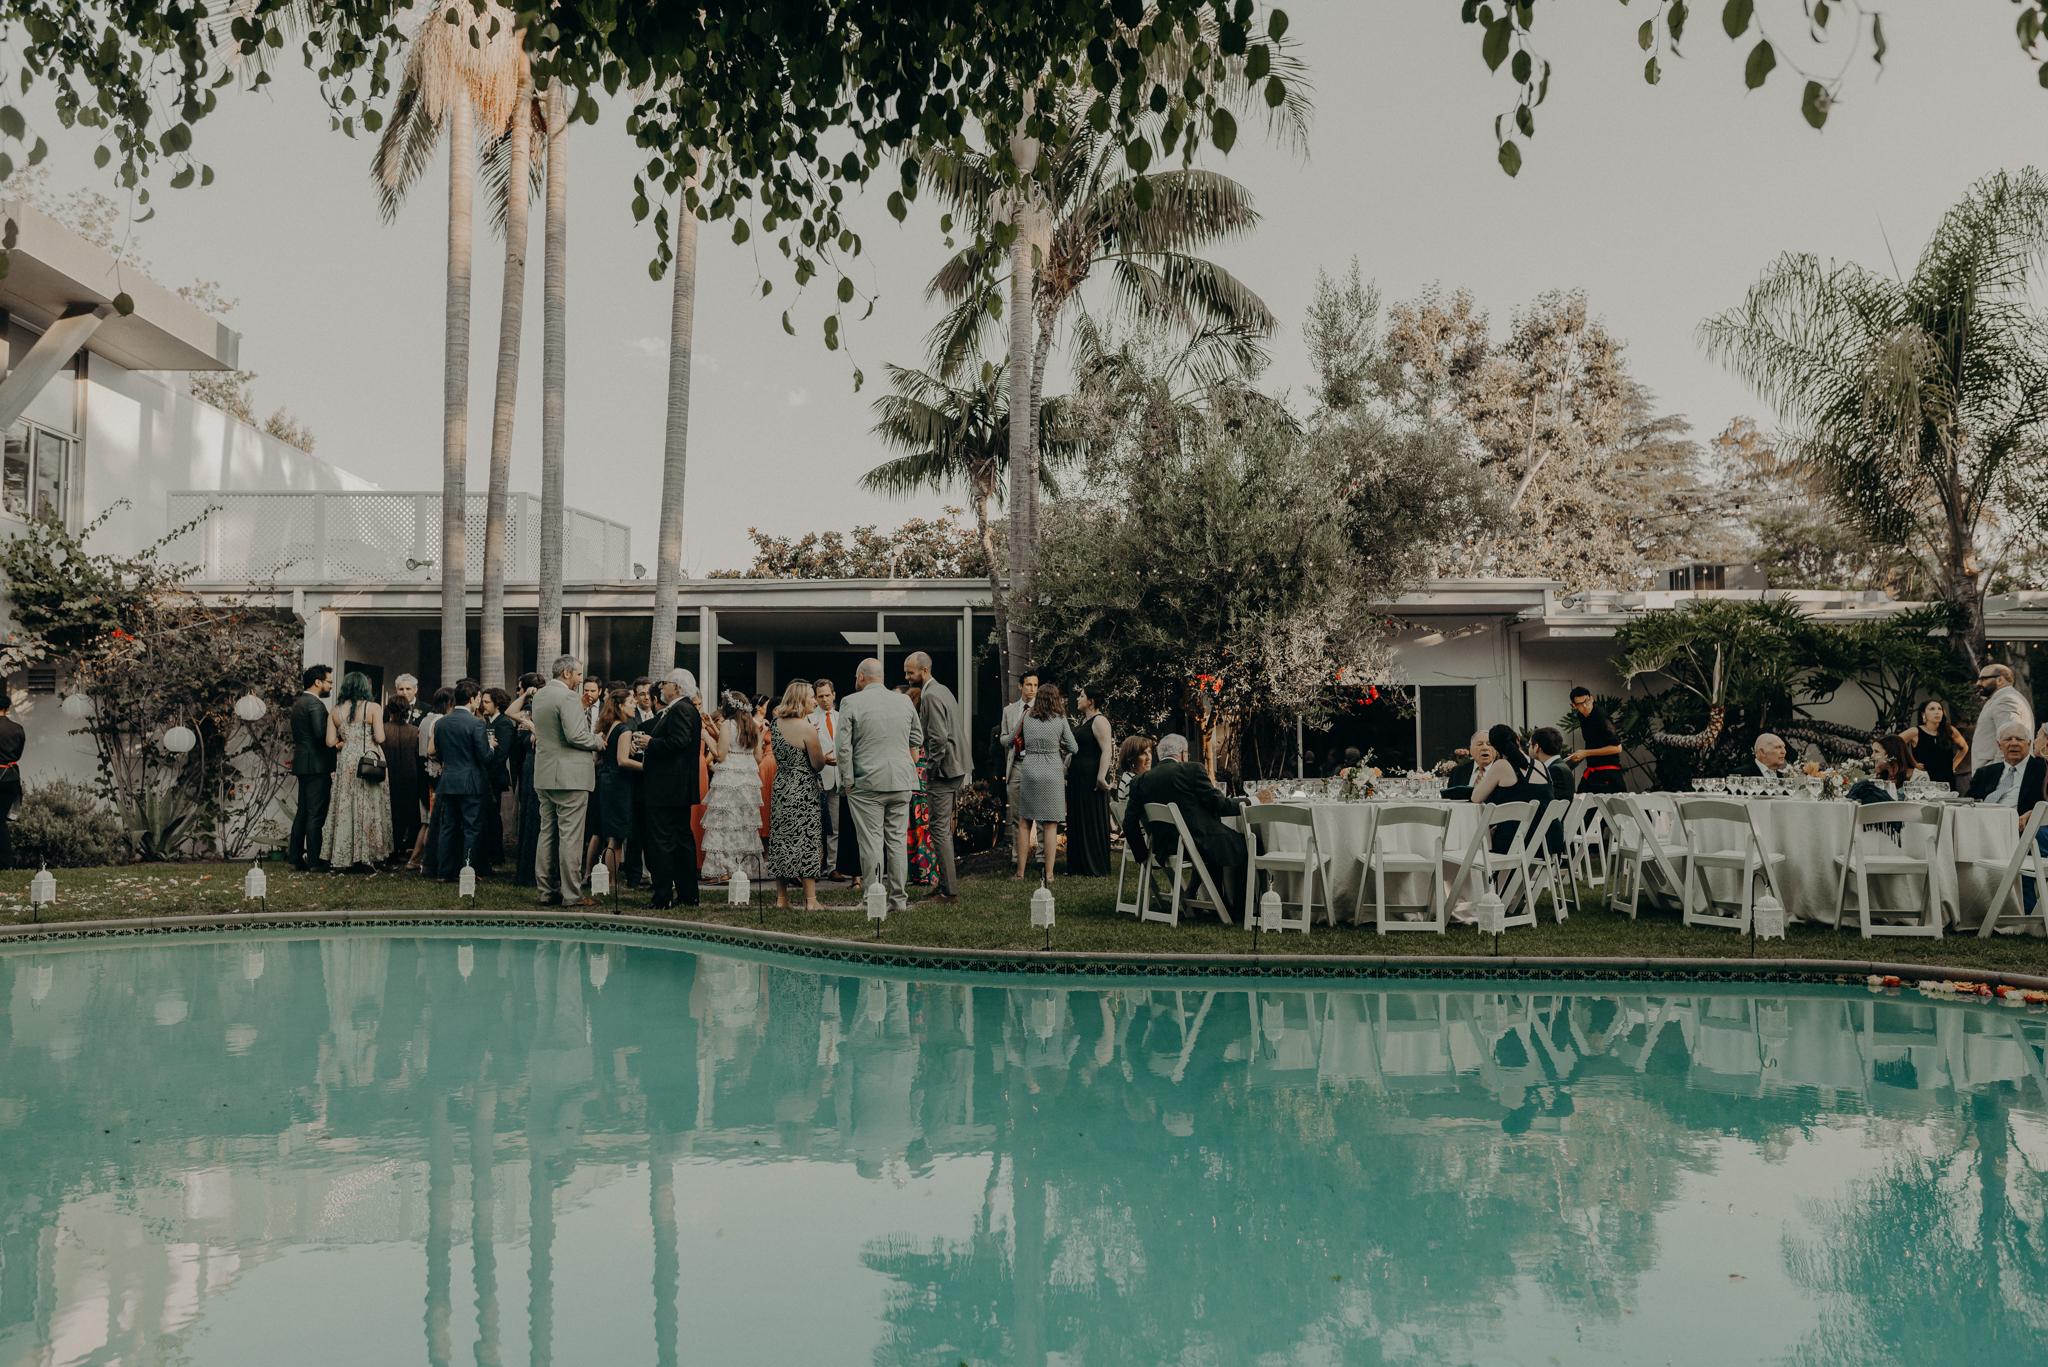 Isaiah + Taylor Photography - Private Estate Backyard Wedding - Beverly Hills - Los Angeles Wedding Photographer - 87.jpg